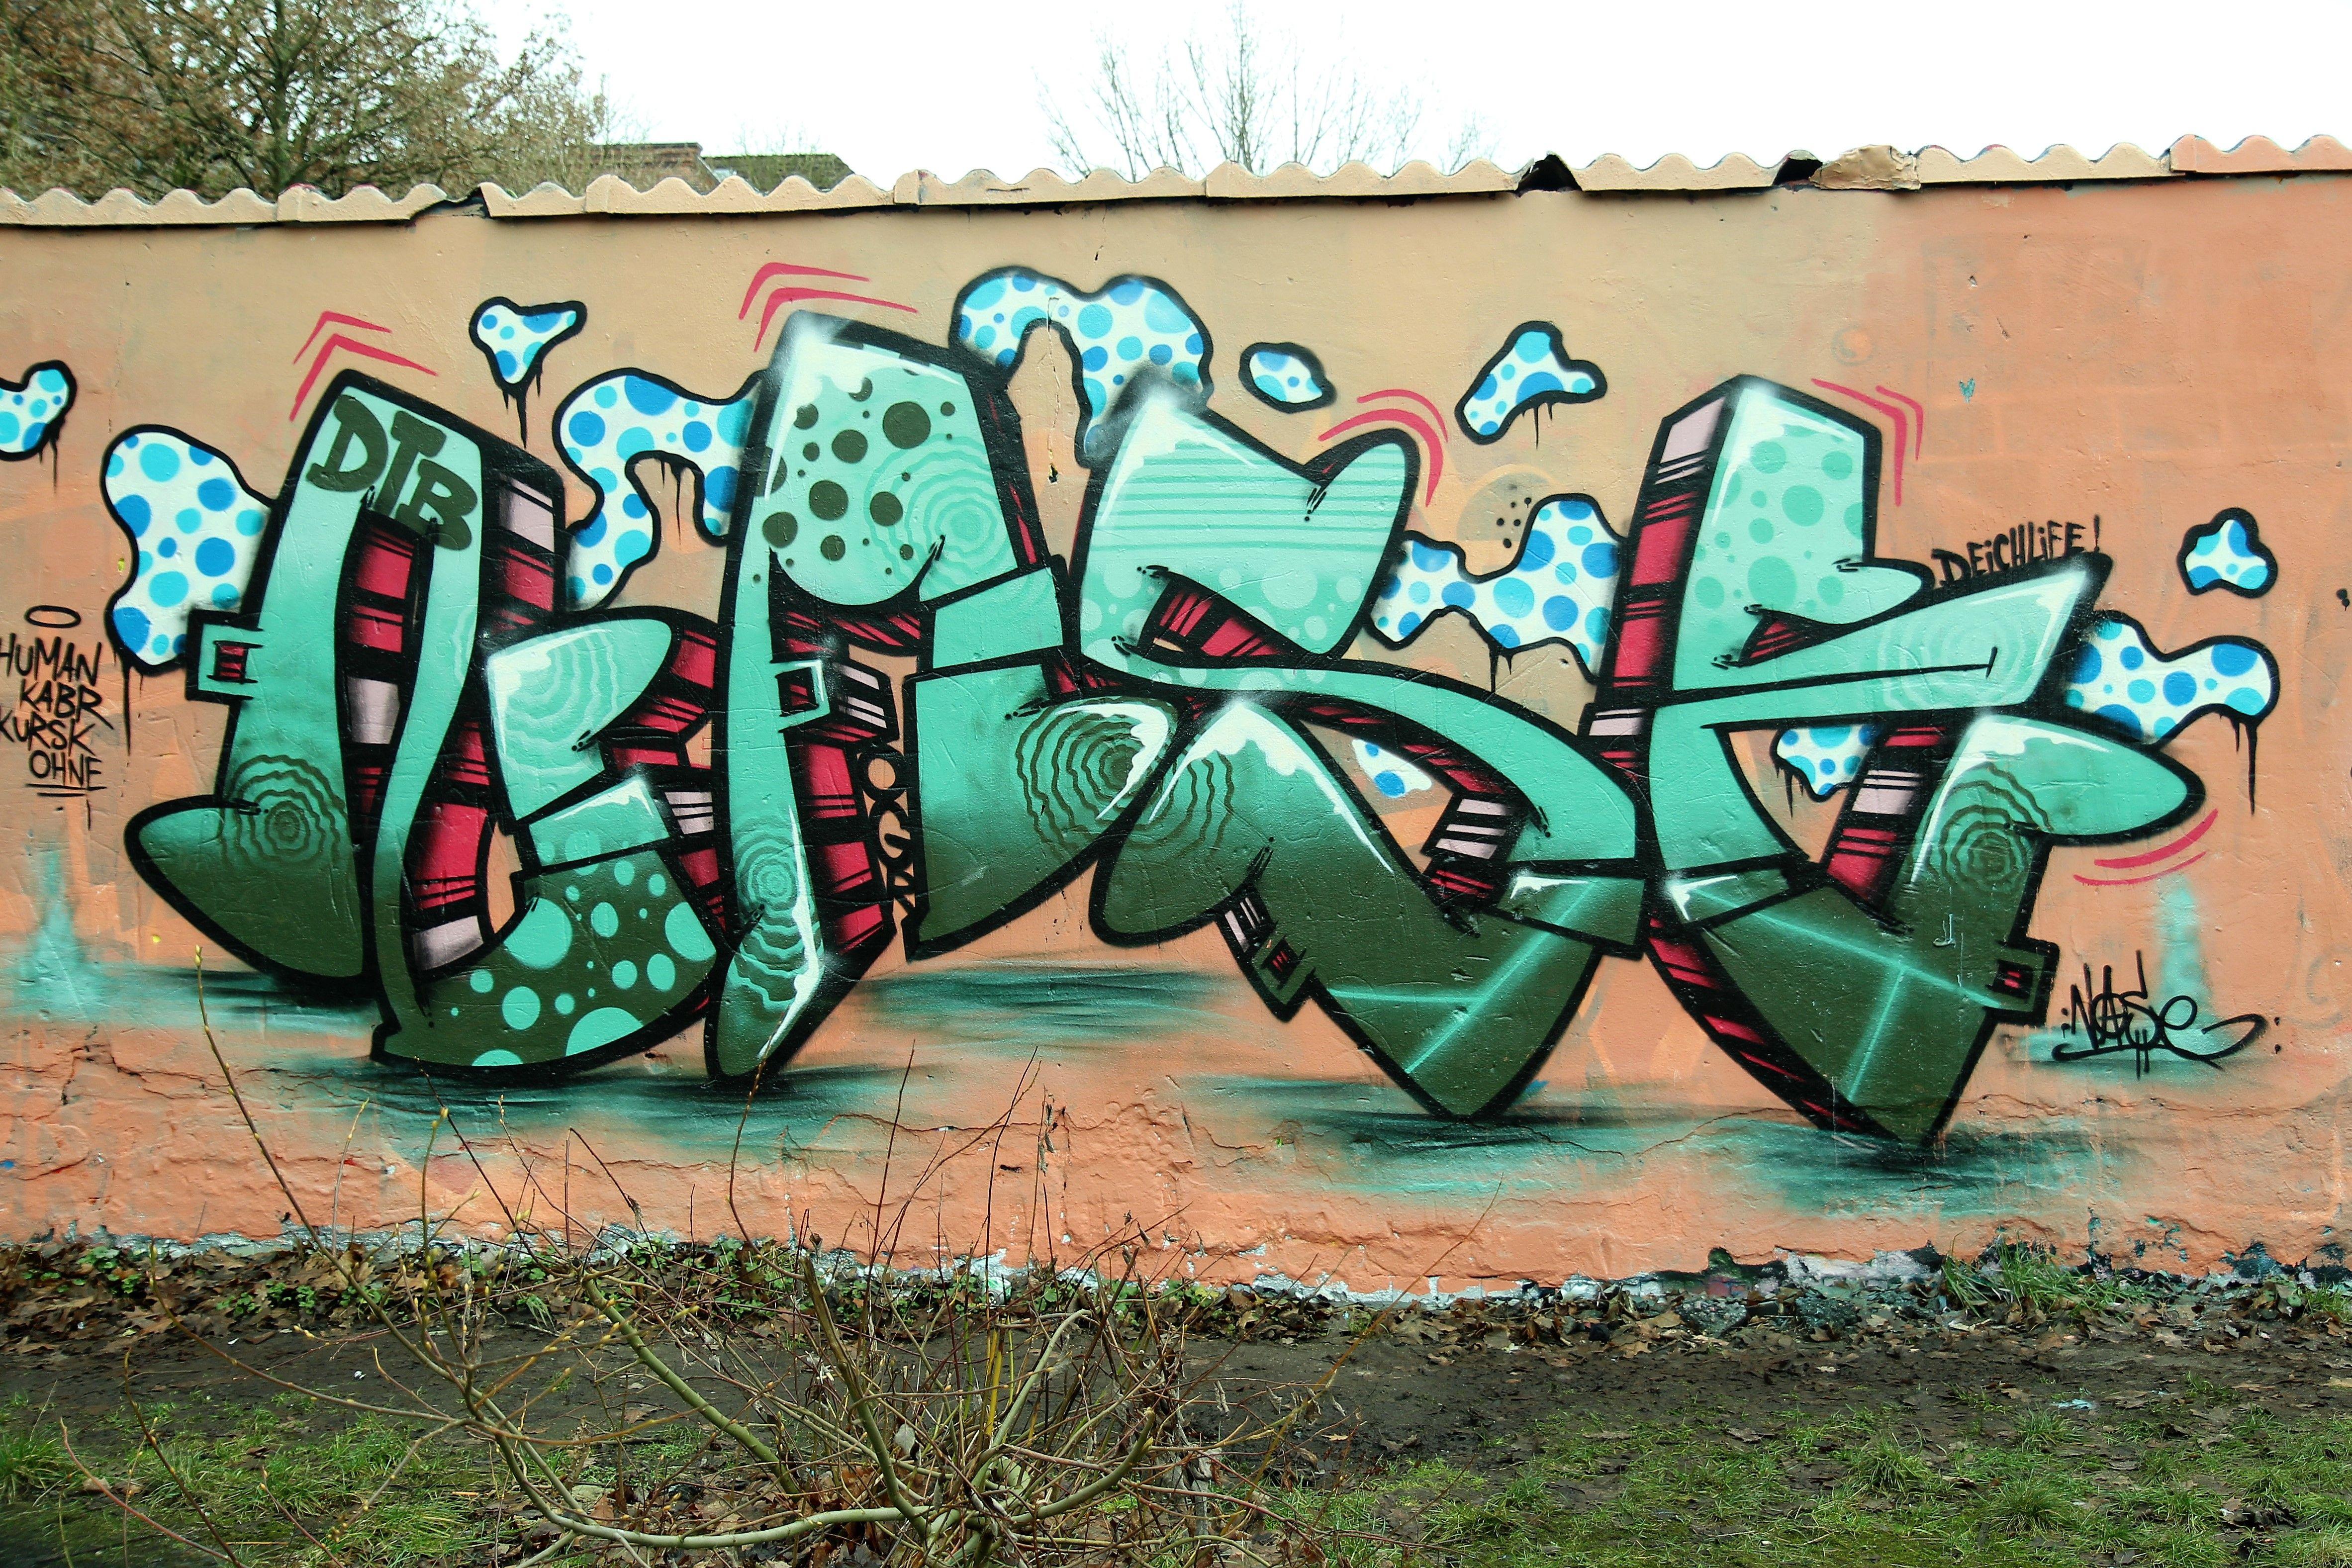 Граффити смотреть фото рисунков